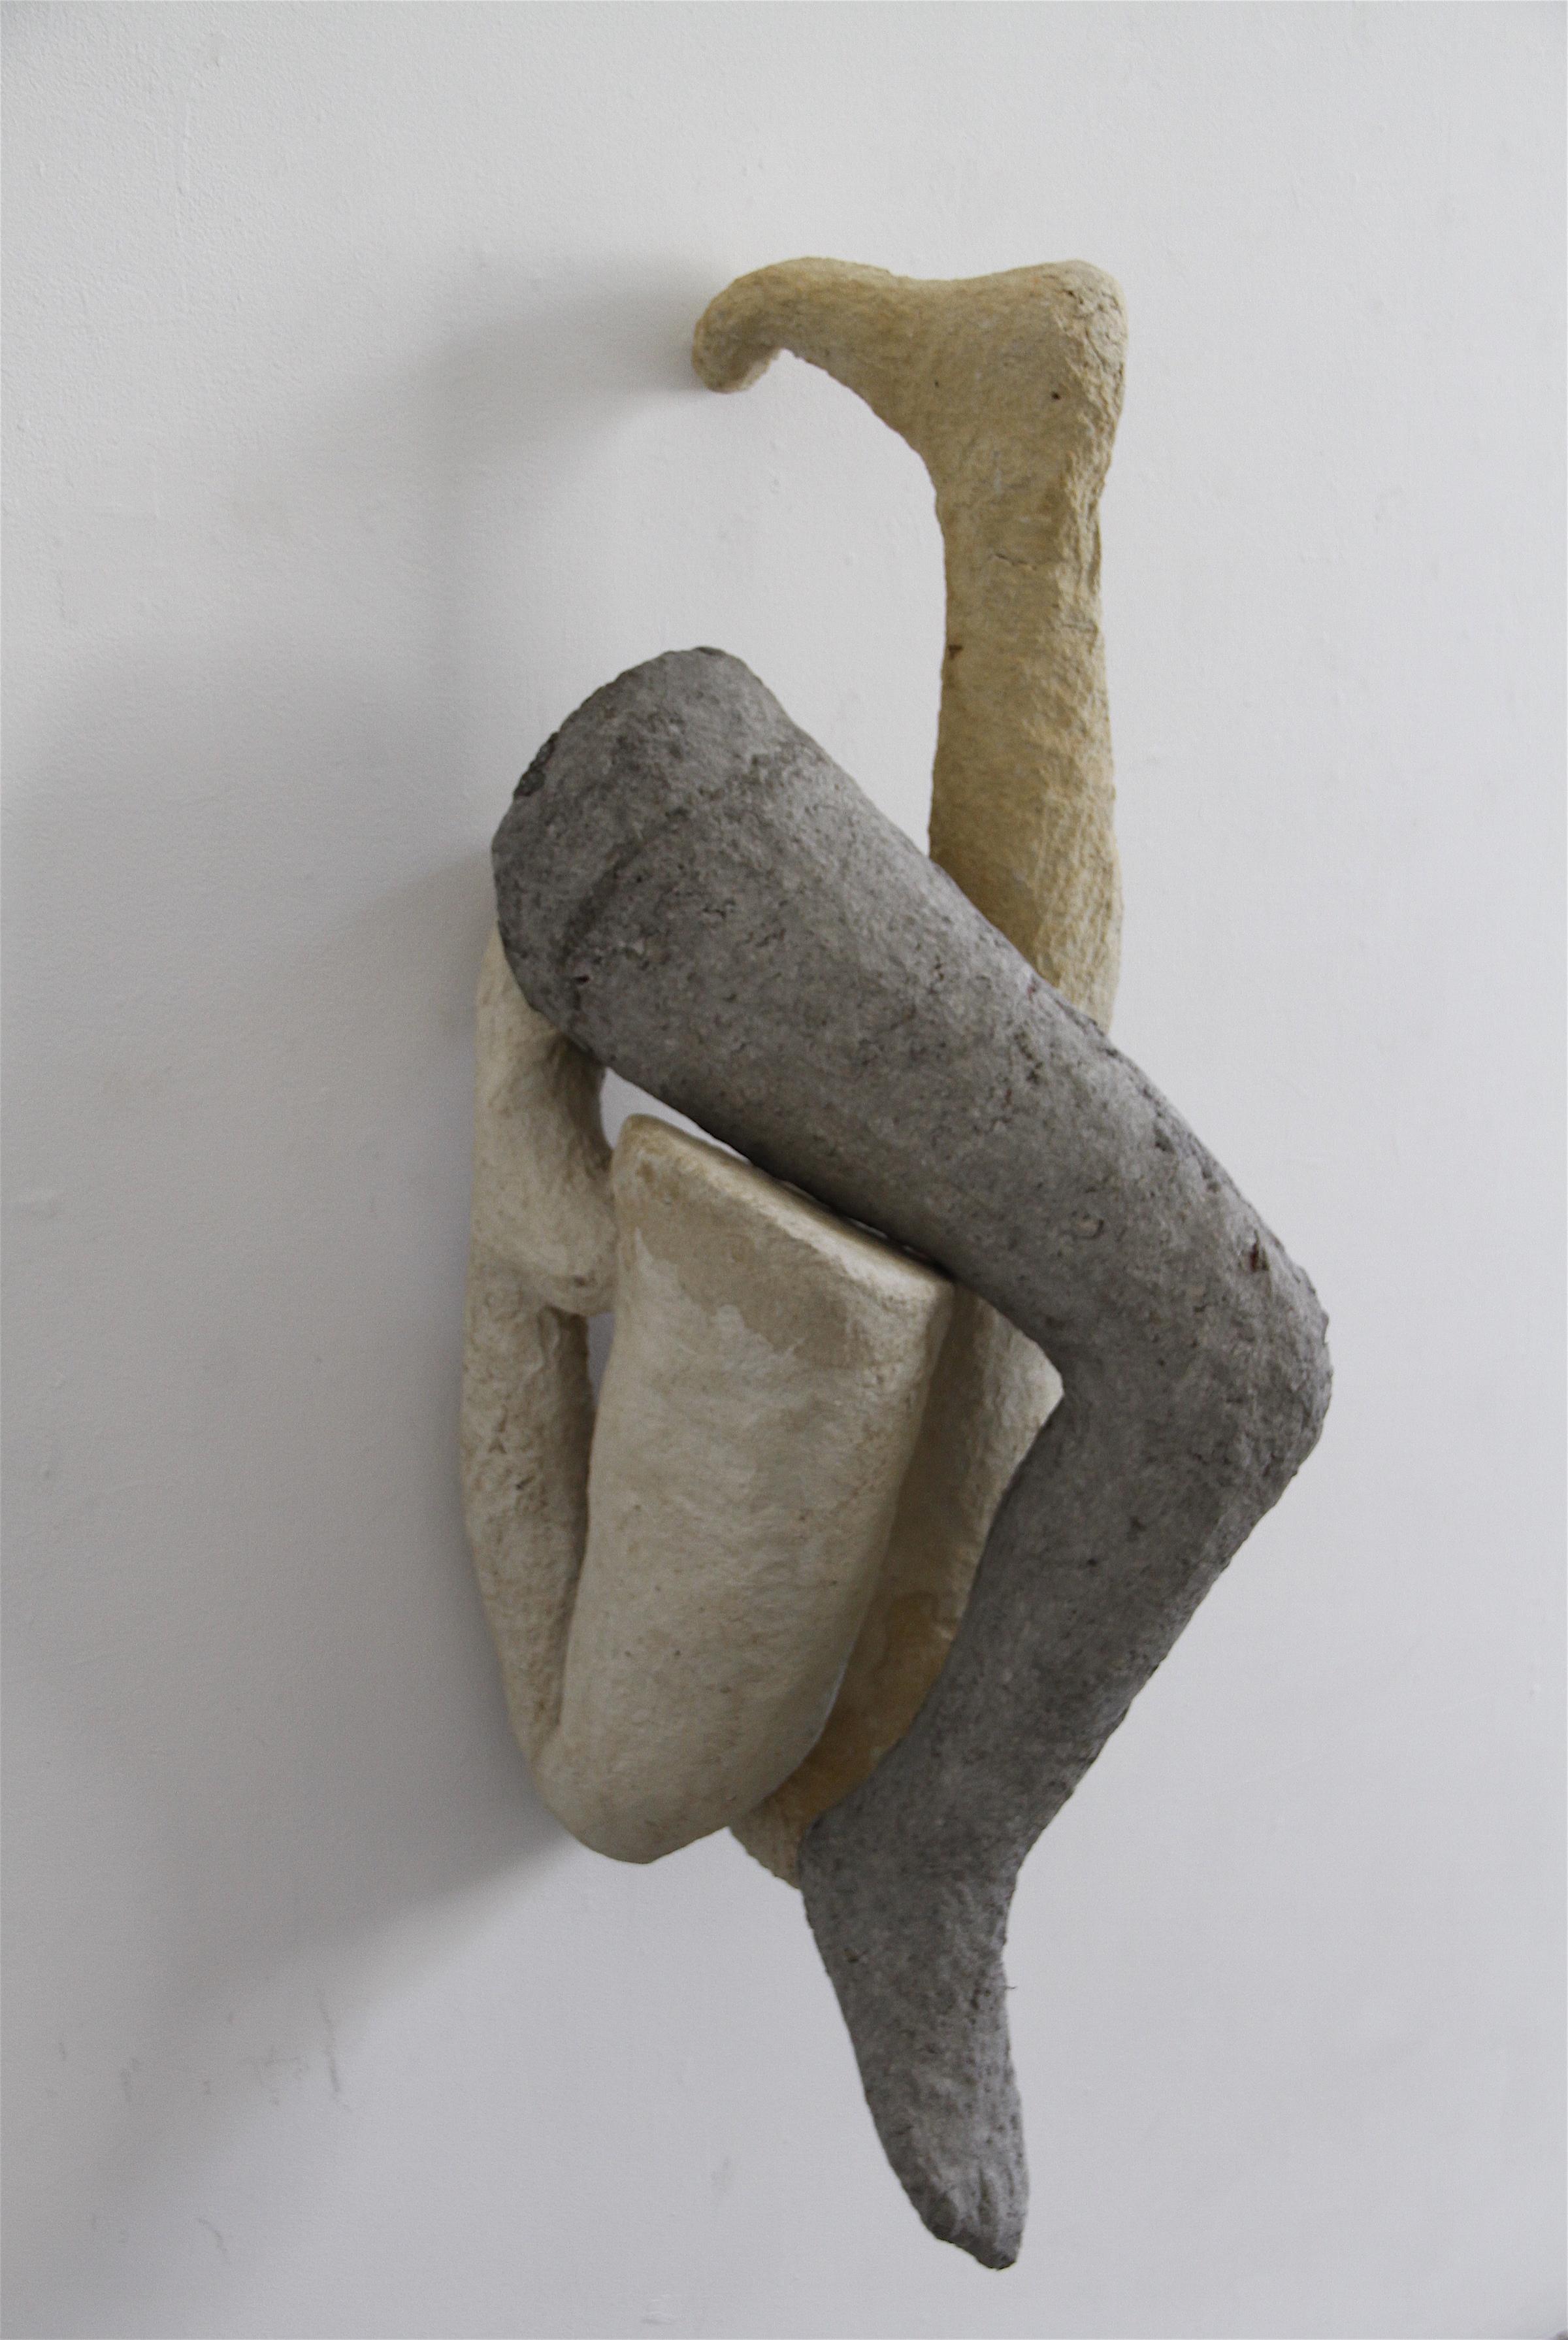 Carmen Lang,  Trio ,Paper maché, clay 38 x 14 x 19 inches, 2013